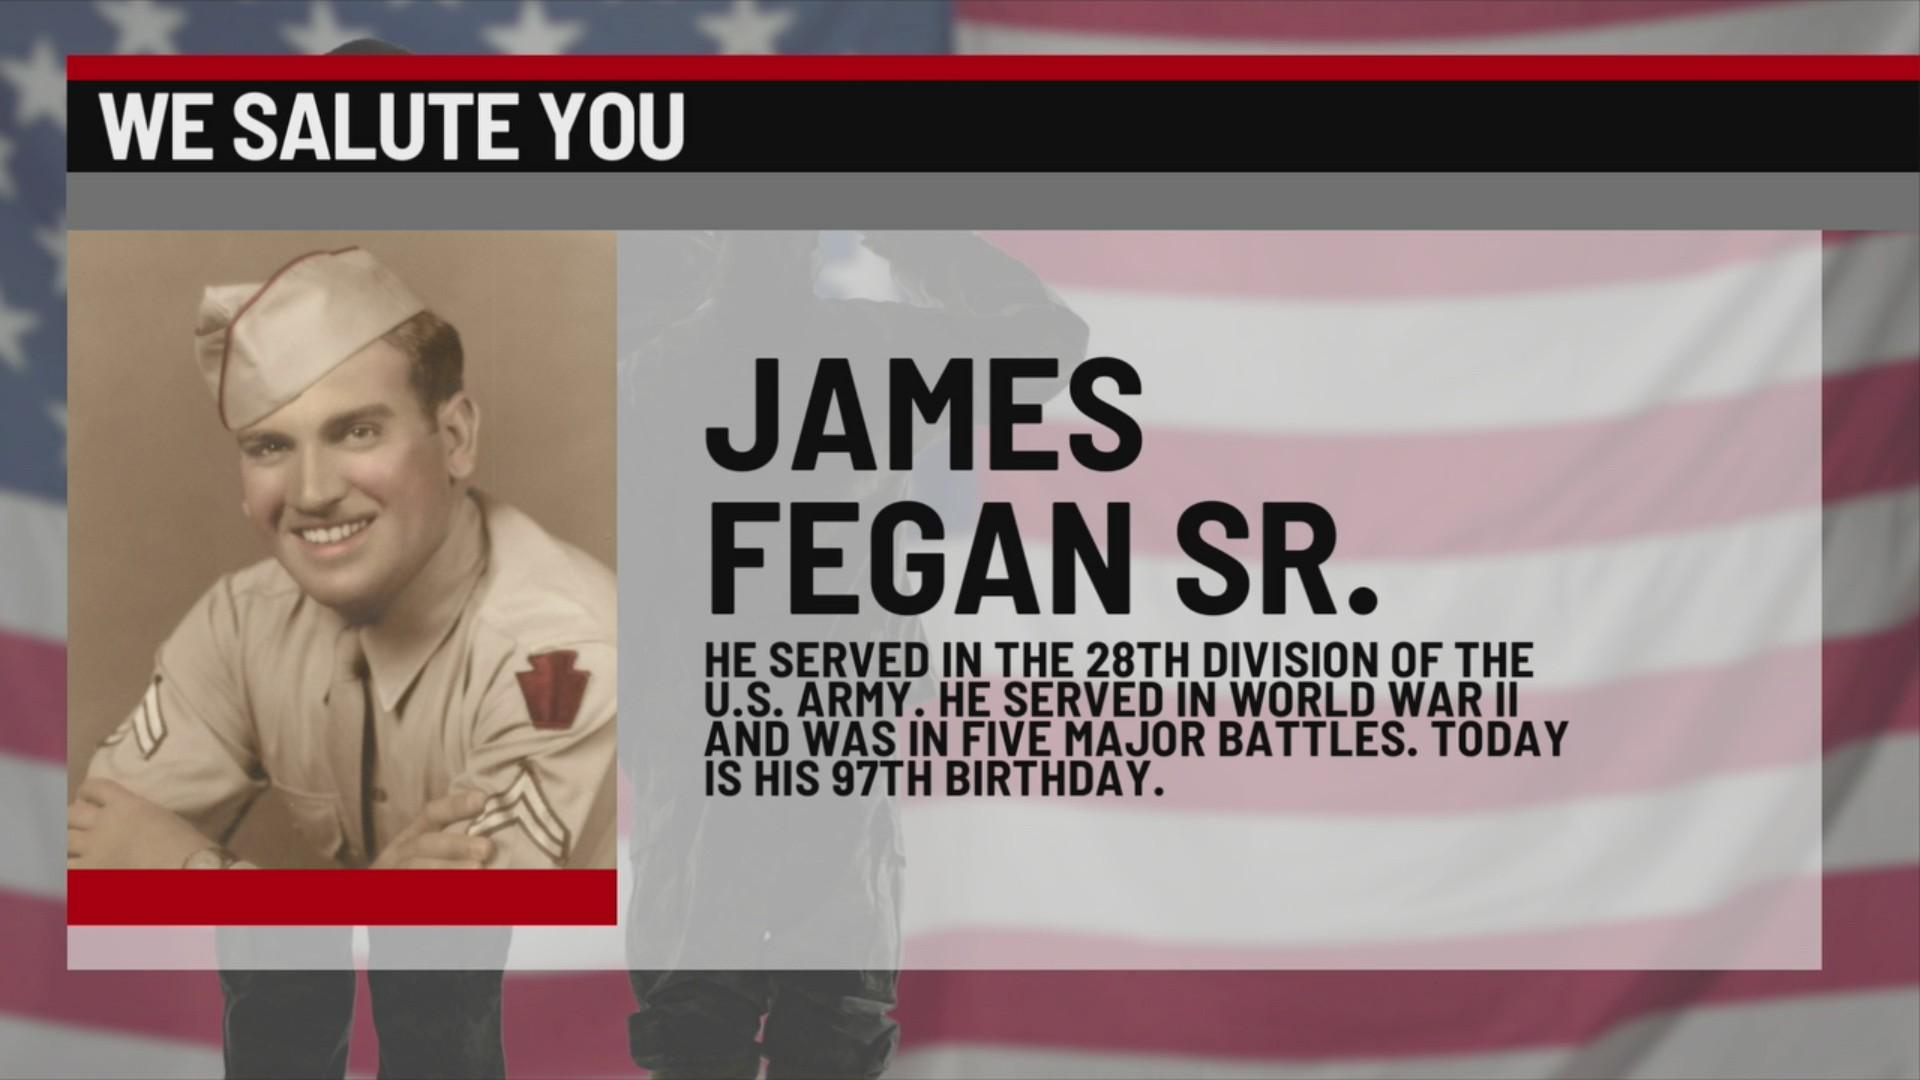 We Salute You James Fegan Sr